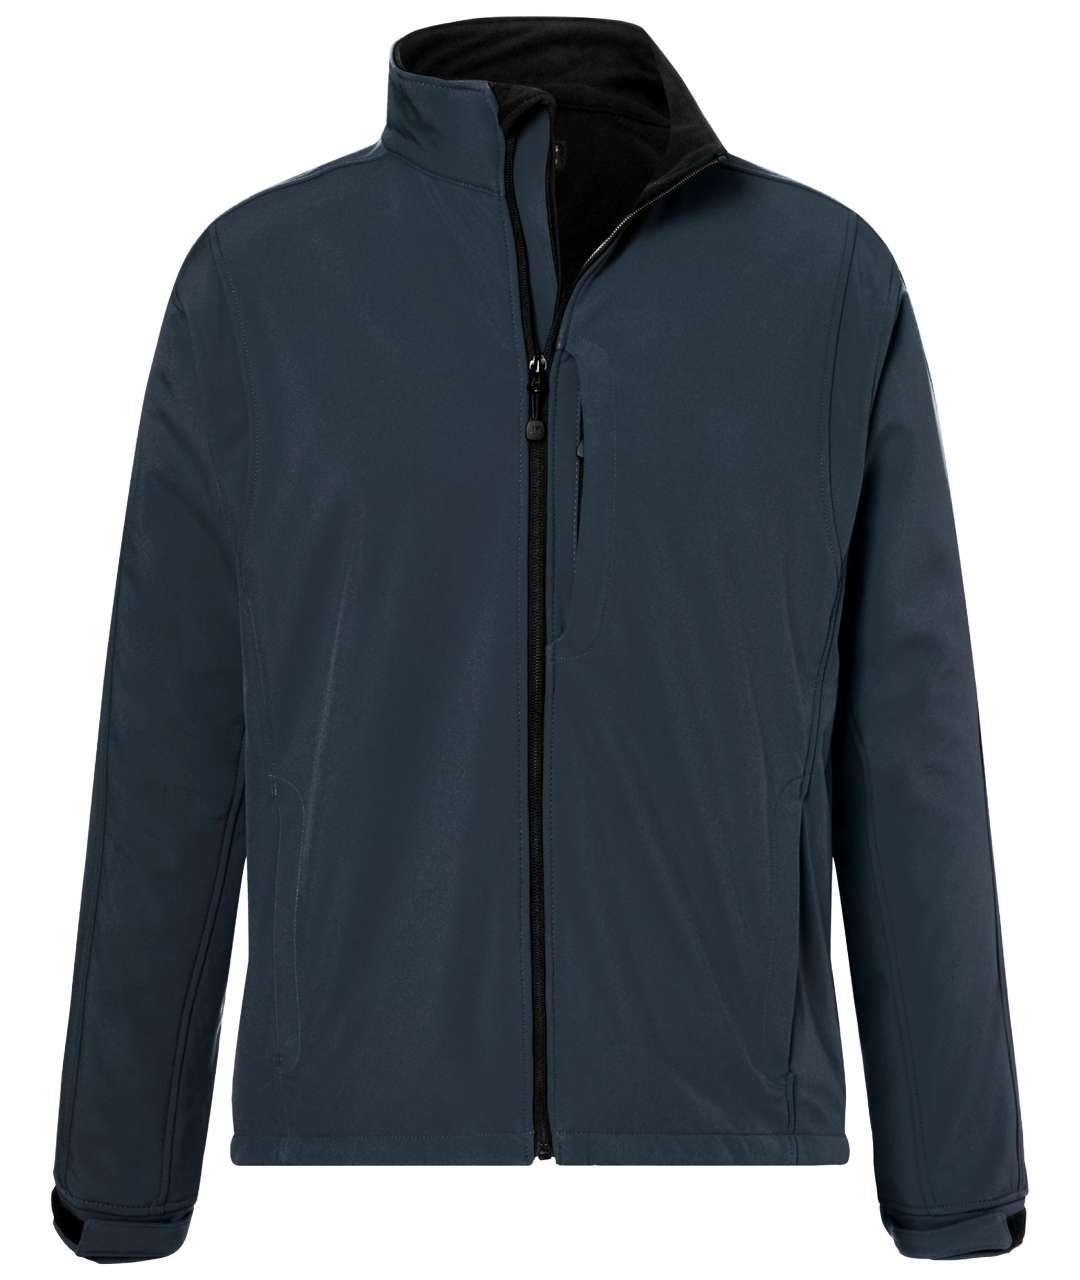 James /& Nicholson Herren Men/'s Promo Softshell Jacket Jacke S M L XL XXL 3XL Neu